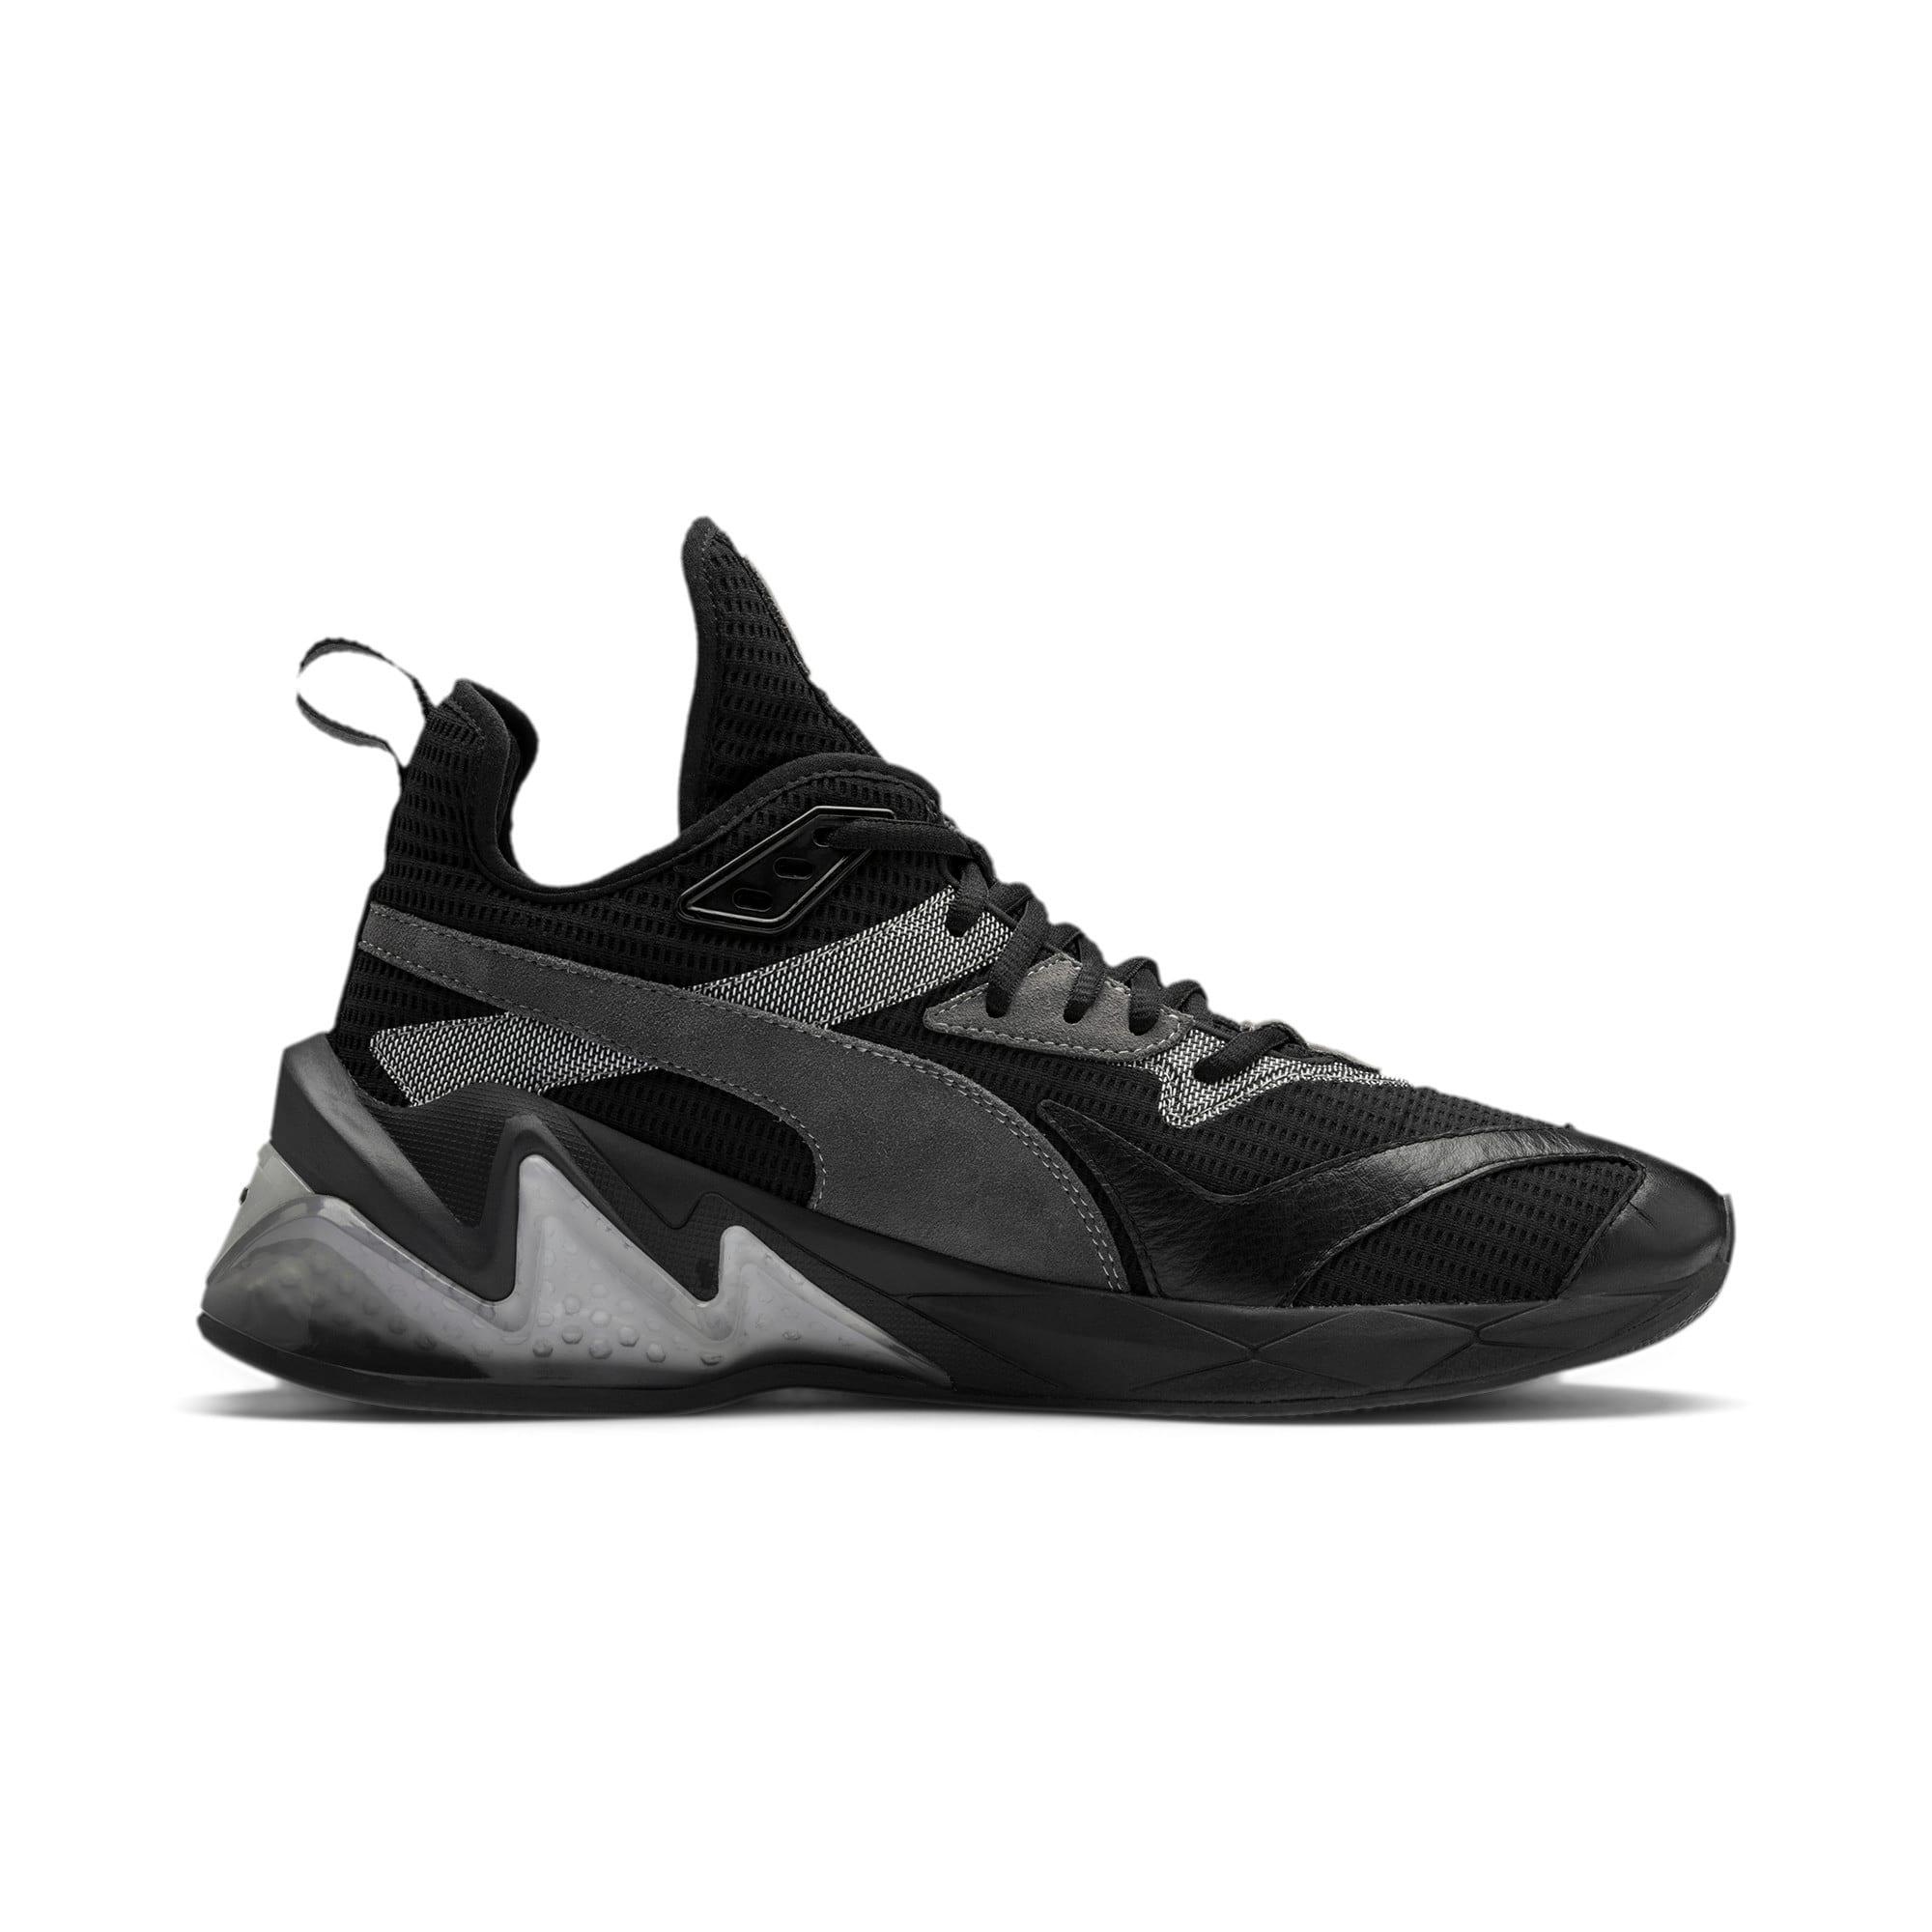 Thumbnail 6 of LQDCELL Origin Men's Training Shoes, Puma Black-Asphalt, medium